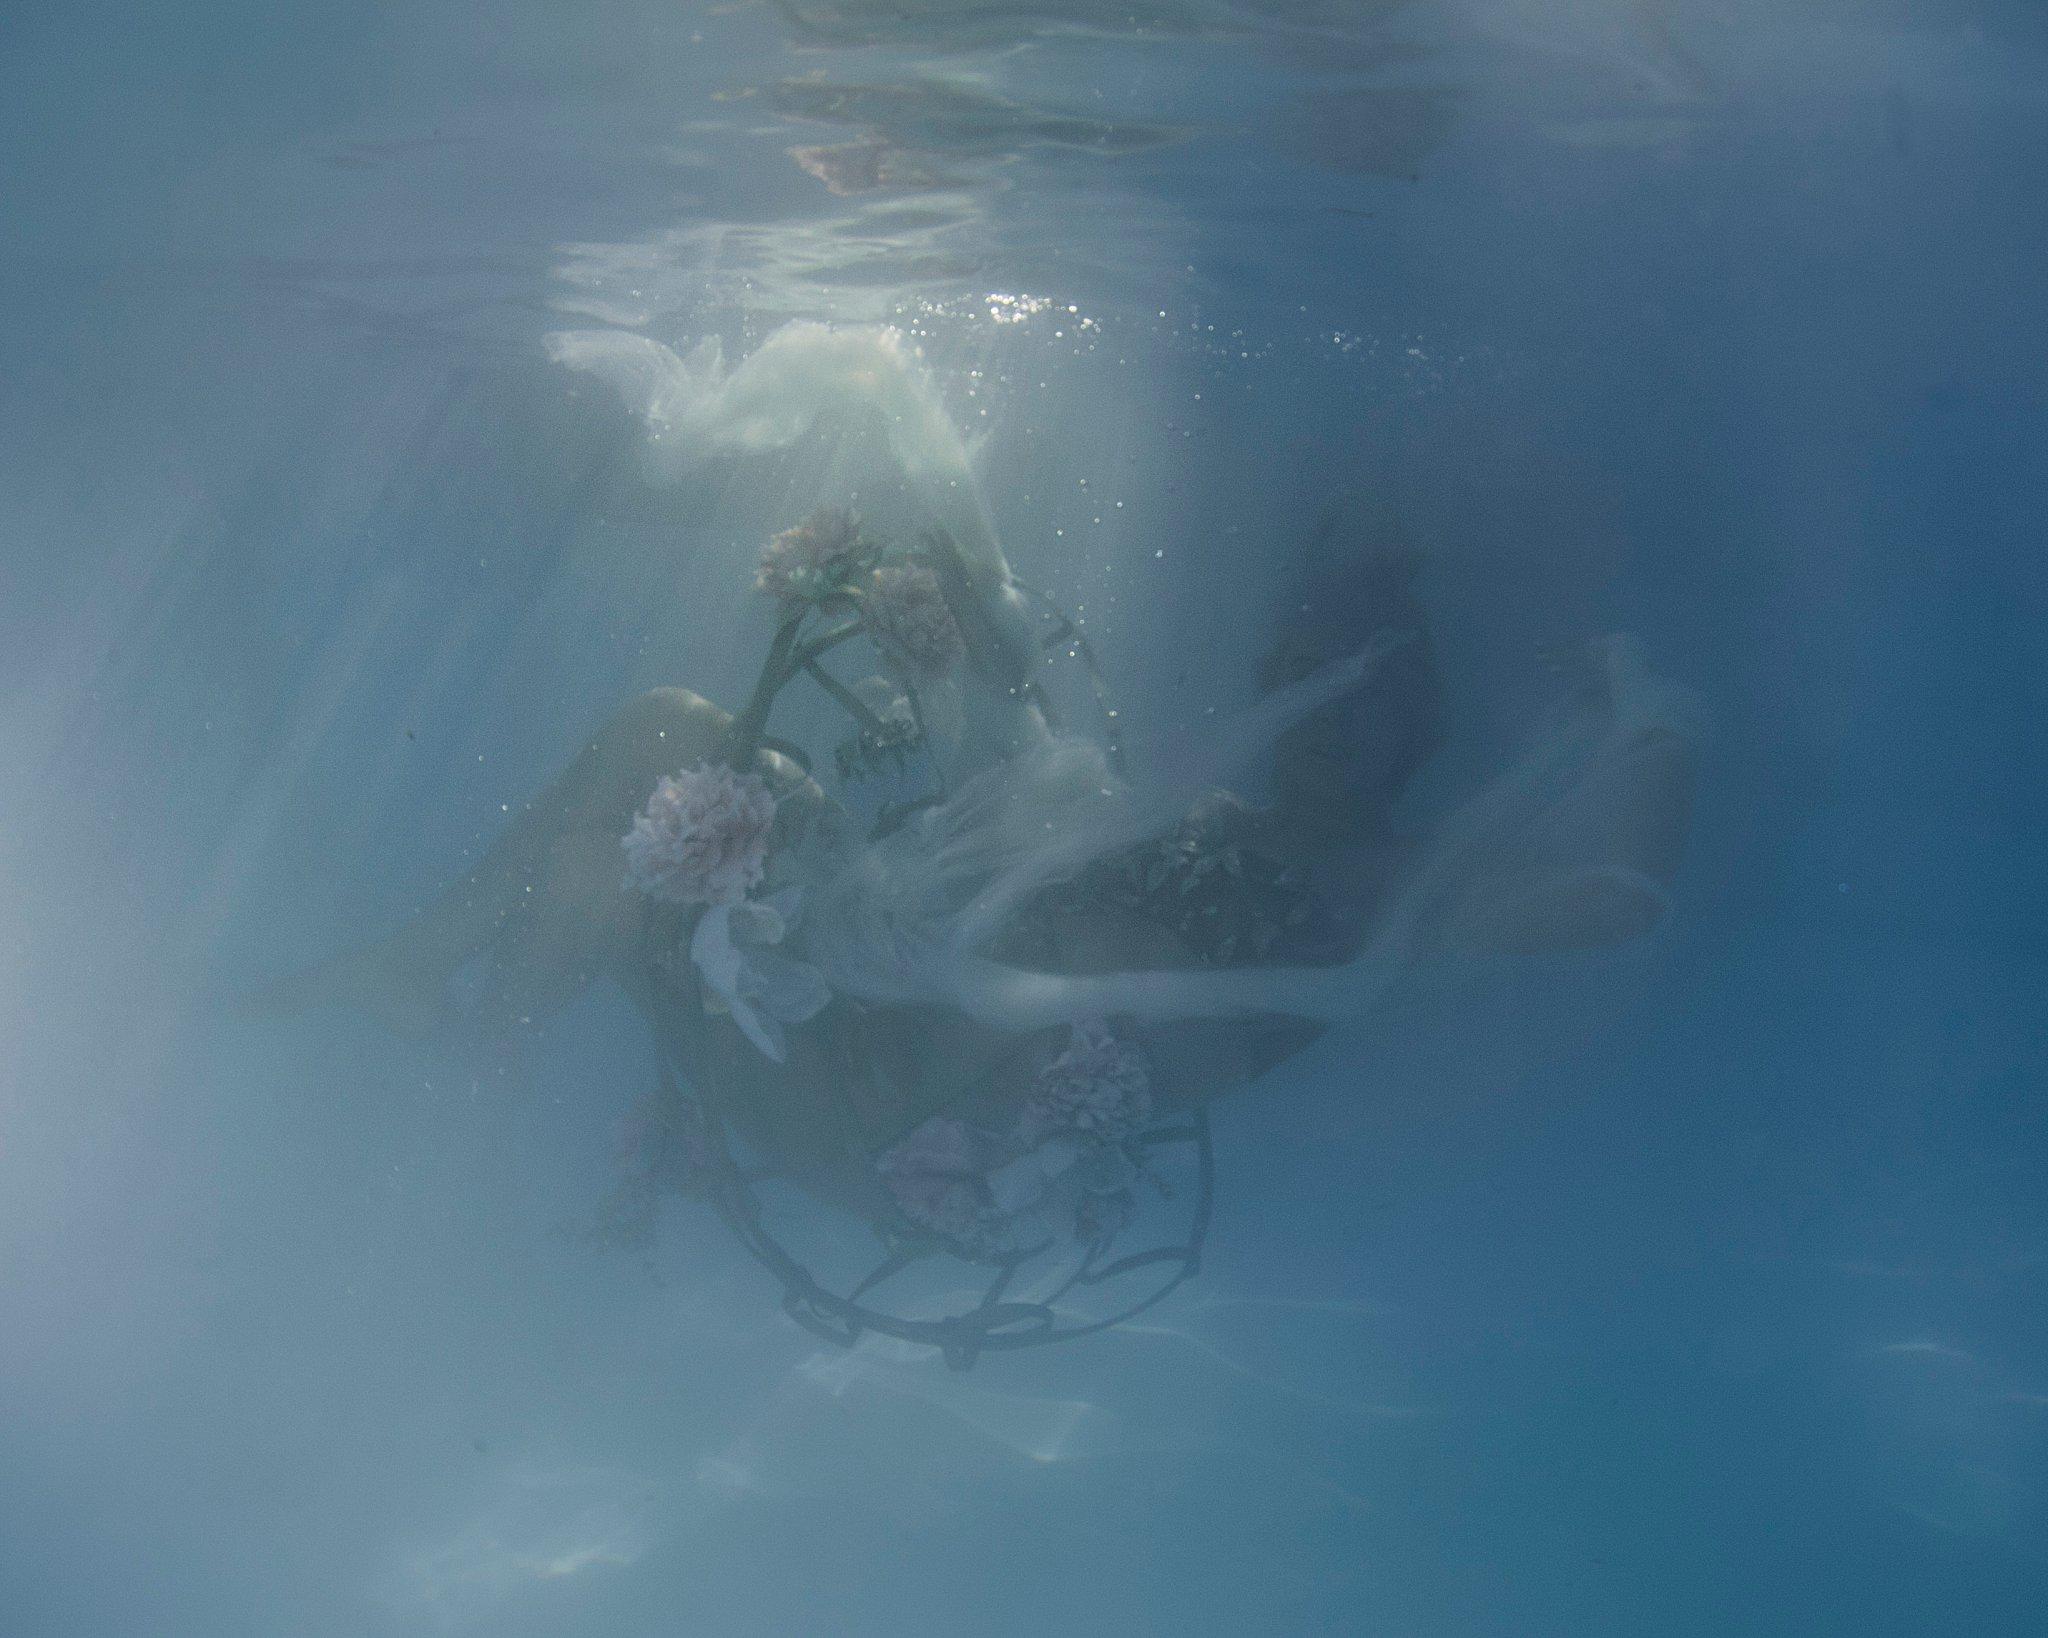 ethereal underwater portrait of ballerina falling in water